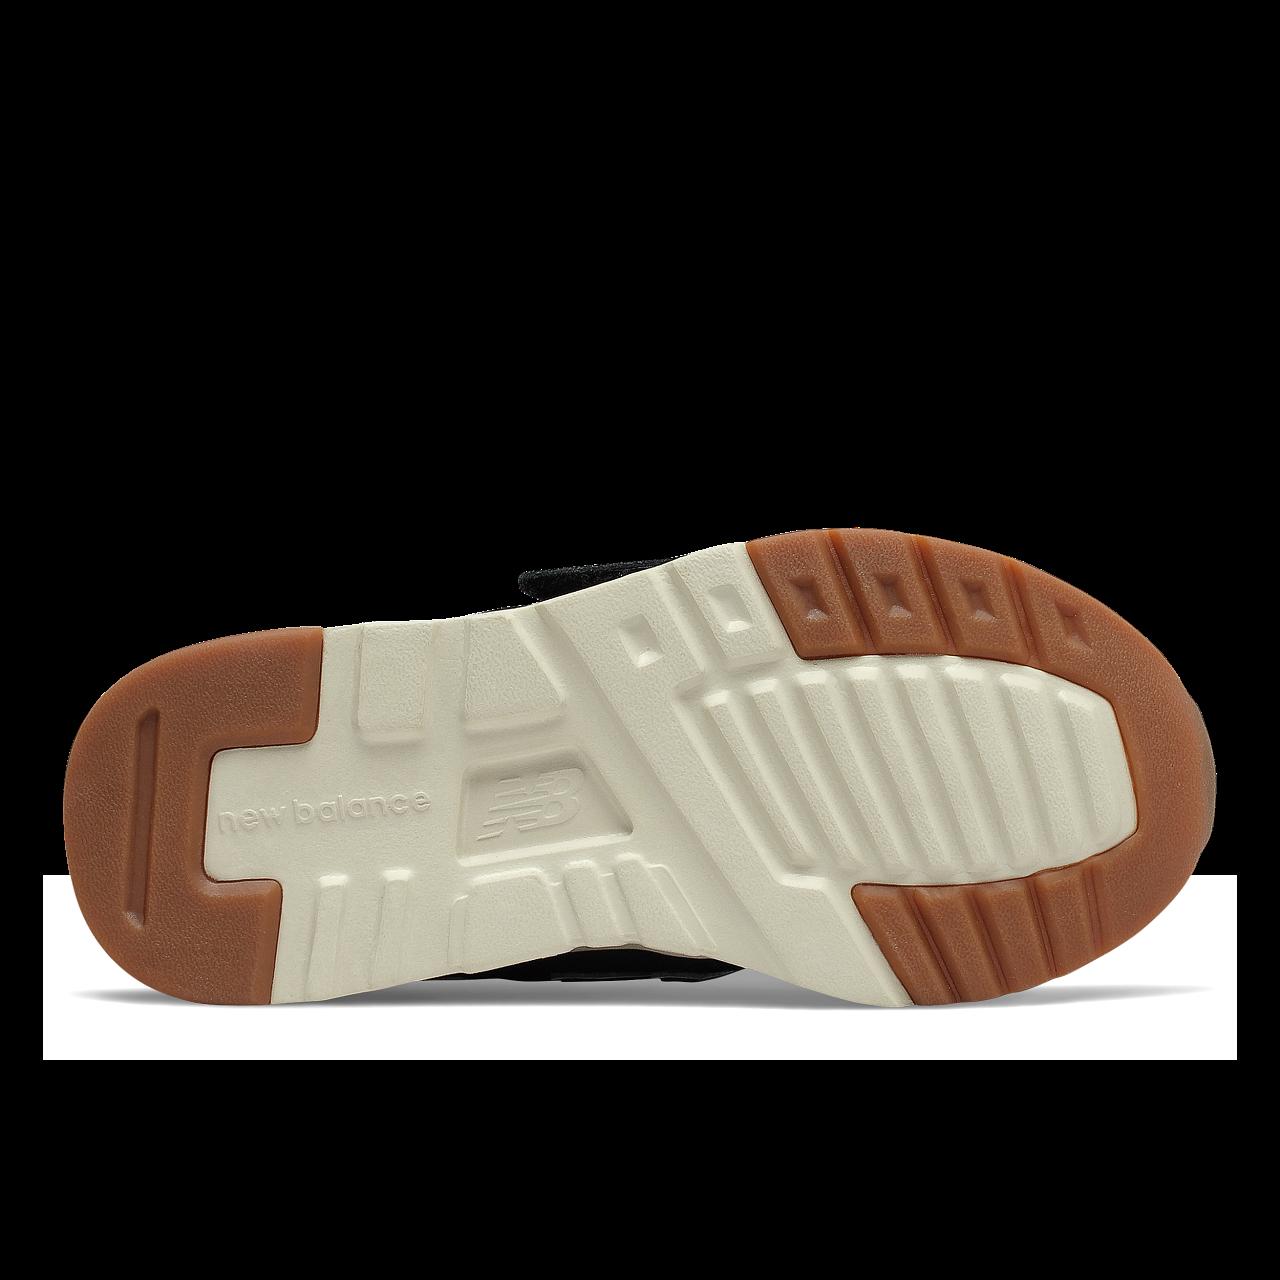 New Balance PZ997HPP Sneakers, Sort, 28